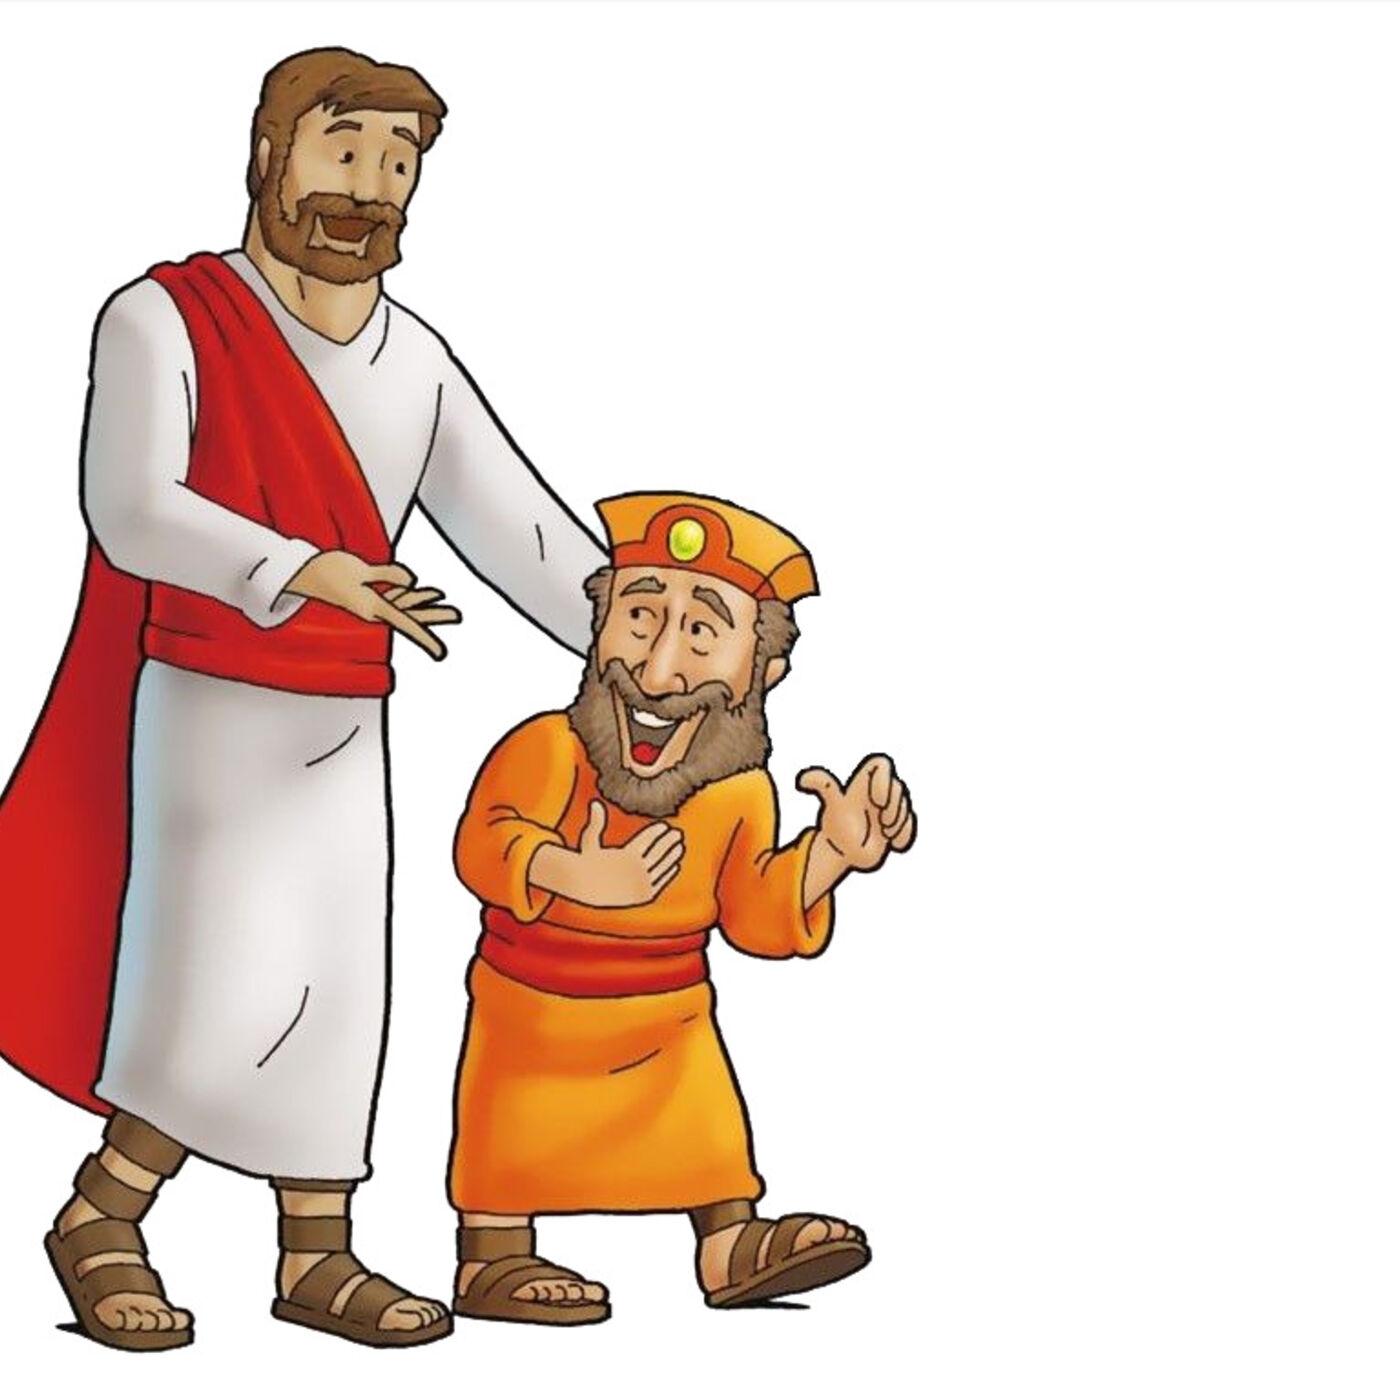 Lies About Zacchaeus